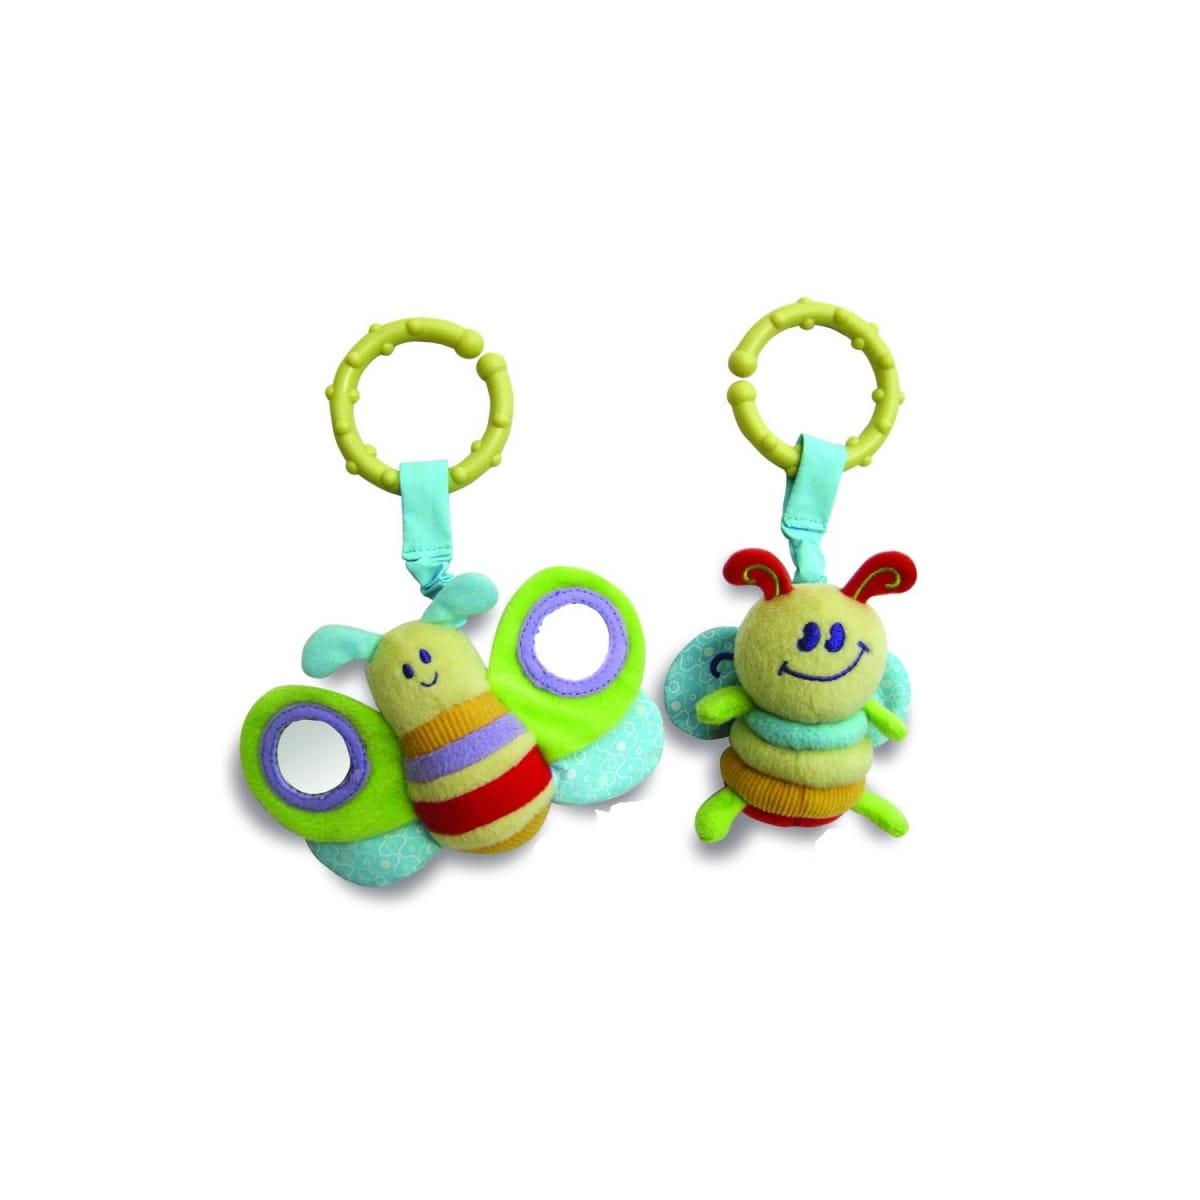 Мягкая игрушка - подвеска LITTLE BIRD TOLD ME Бабочка и пчелка